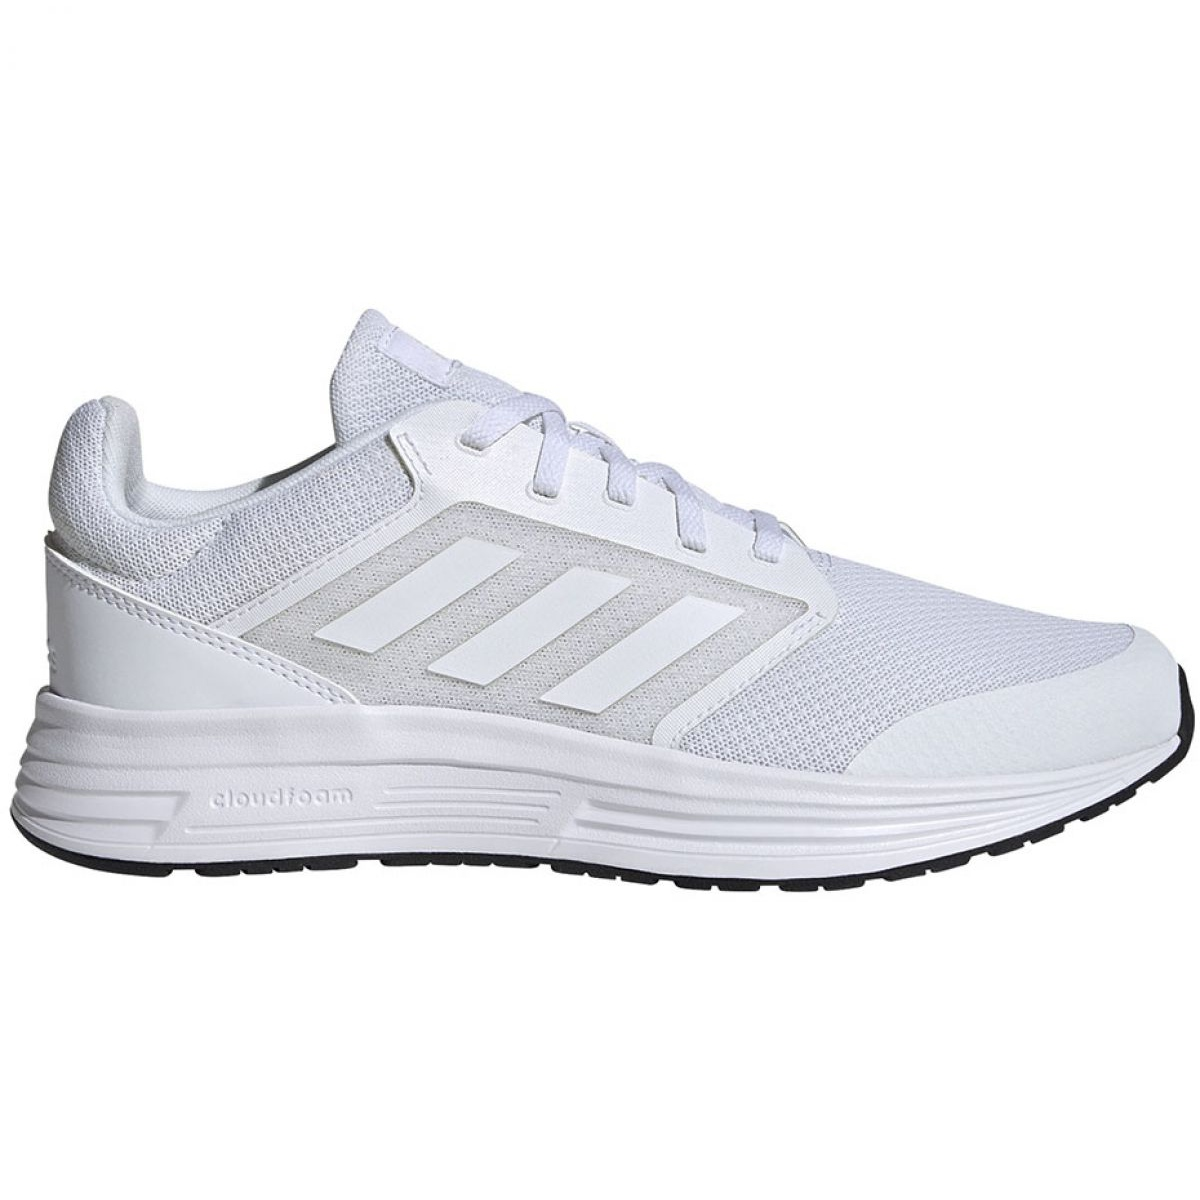 Me gusta Sábana Pisoteando  Adidas Galaxy 5 M FW5716 running shoes white - ButyModne.pl